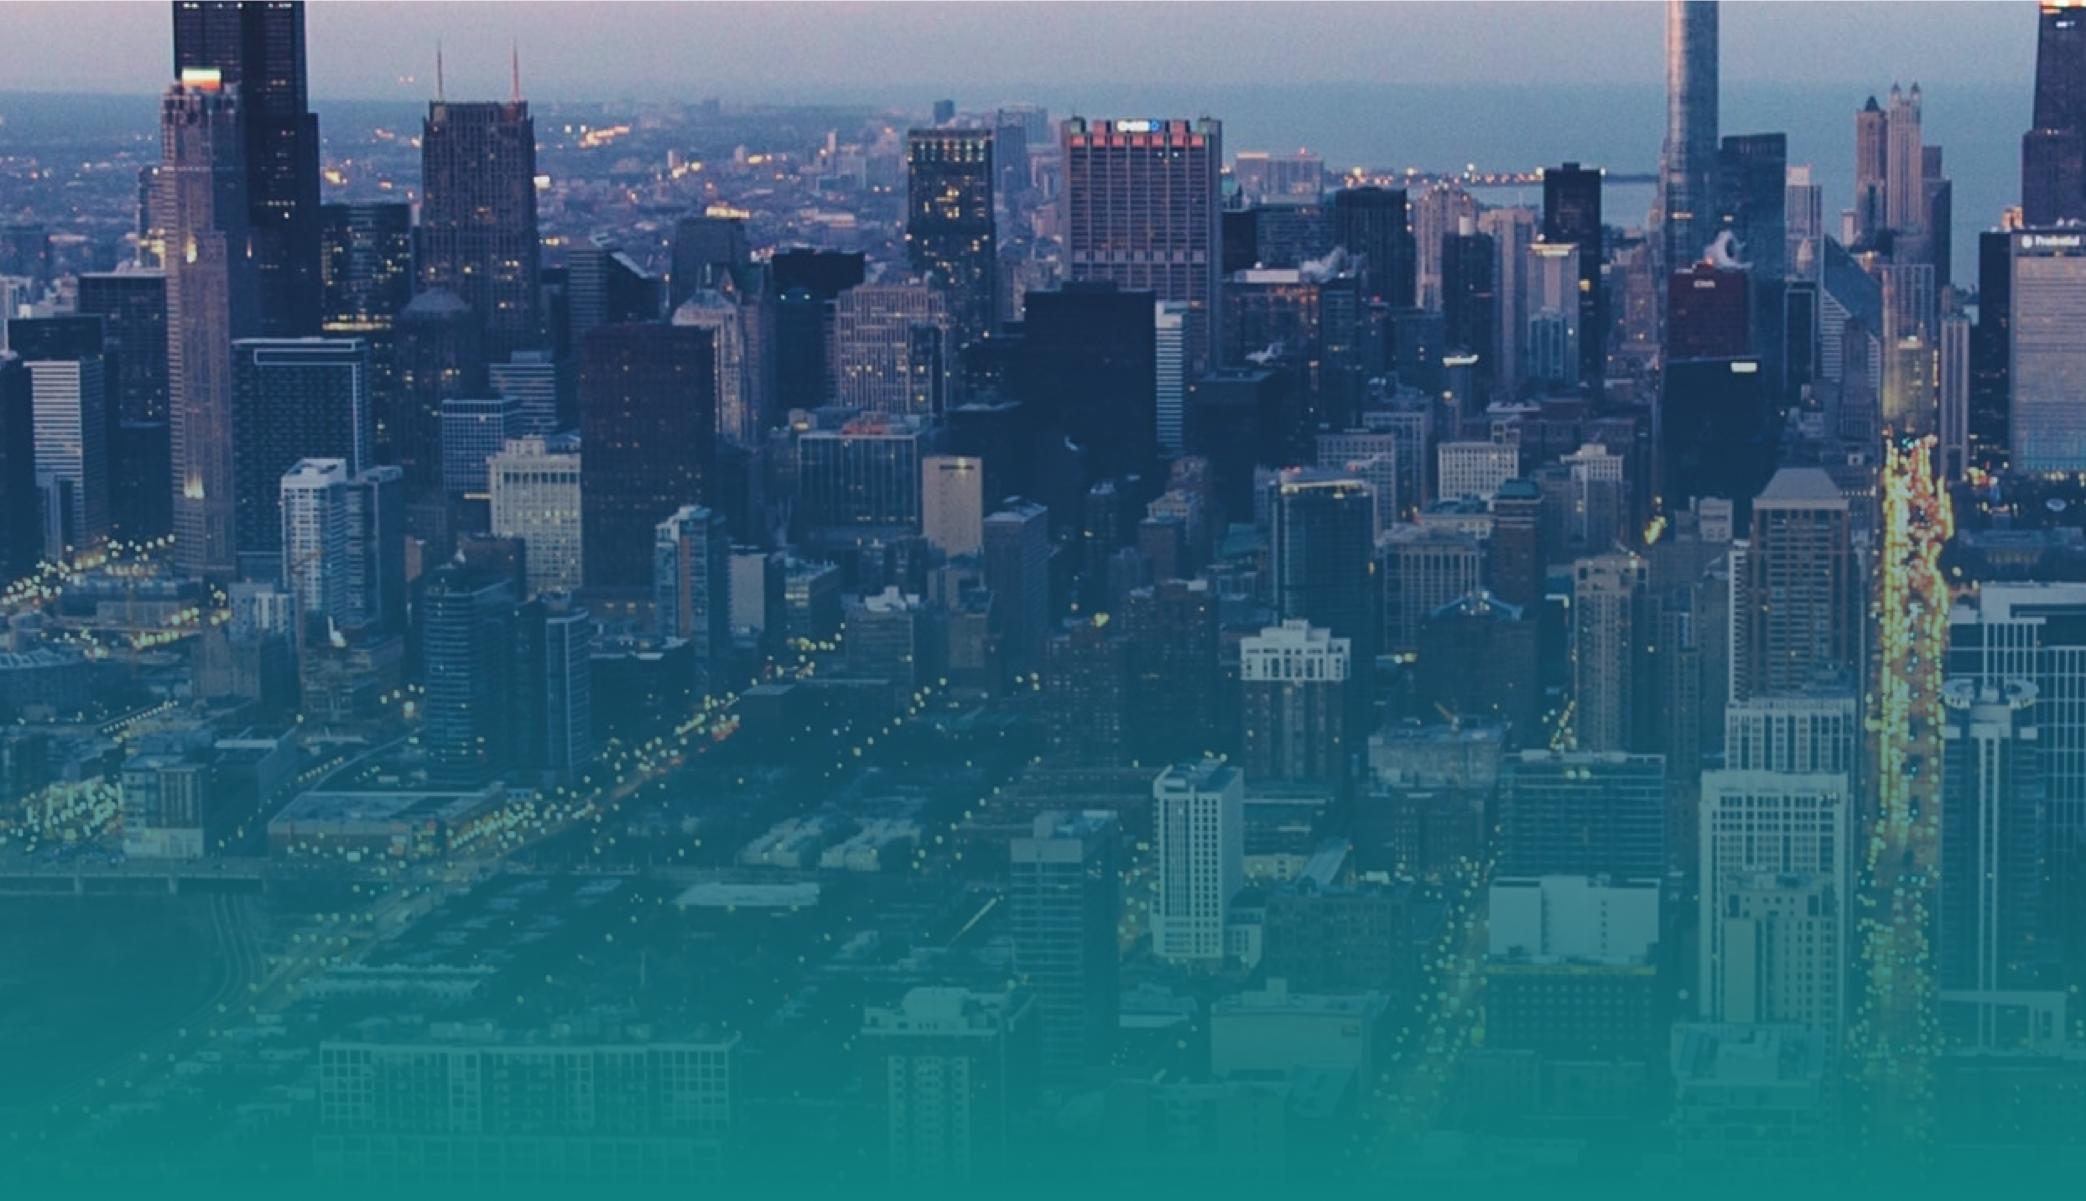 Voosh built a website for Jeffrey Jordan and Savan Avakian. JAG, Jordan Avakian Group. This is a photo of Chicago